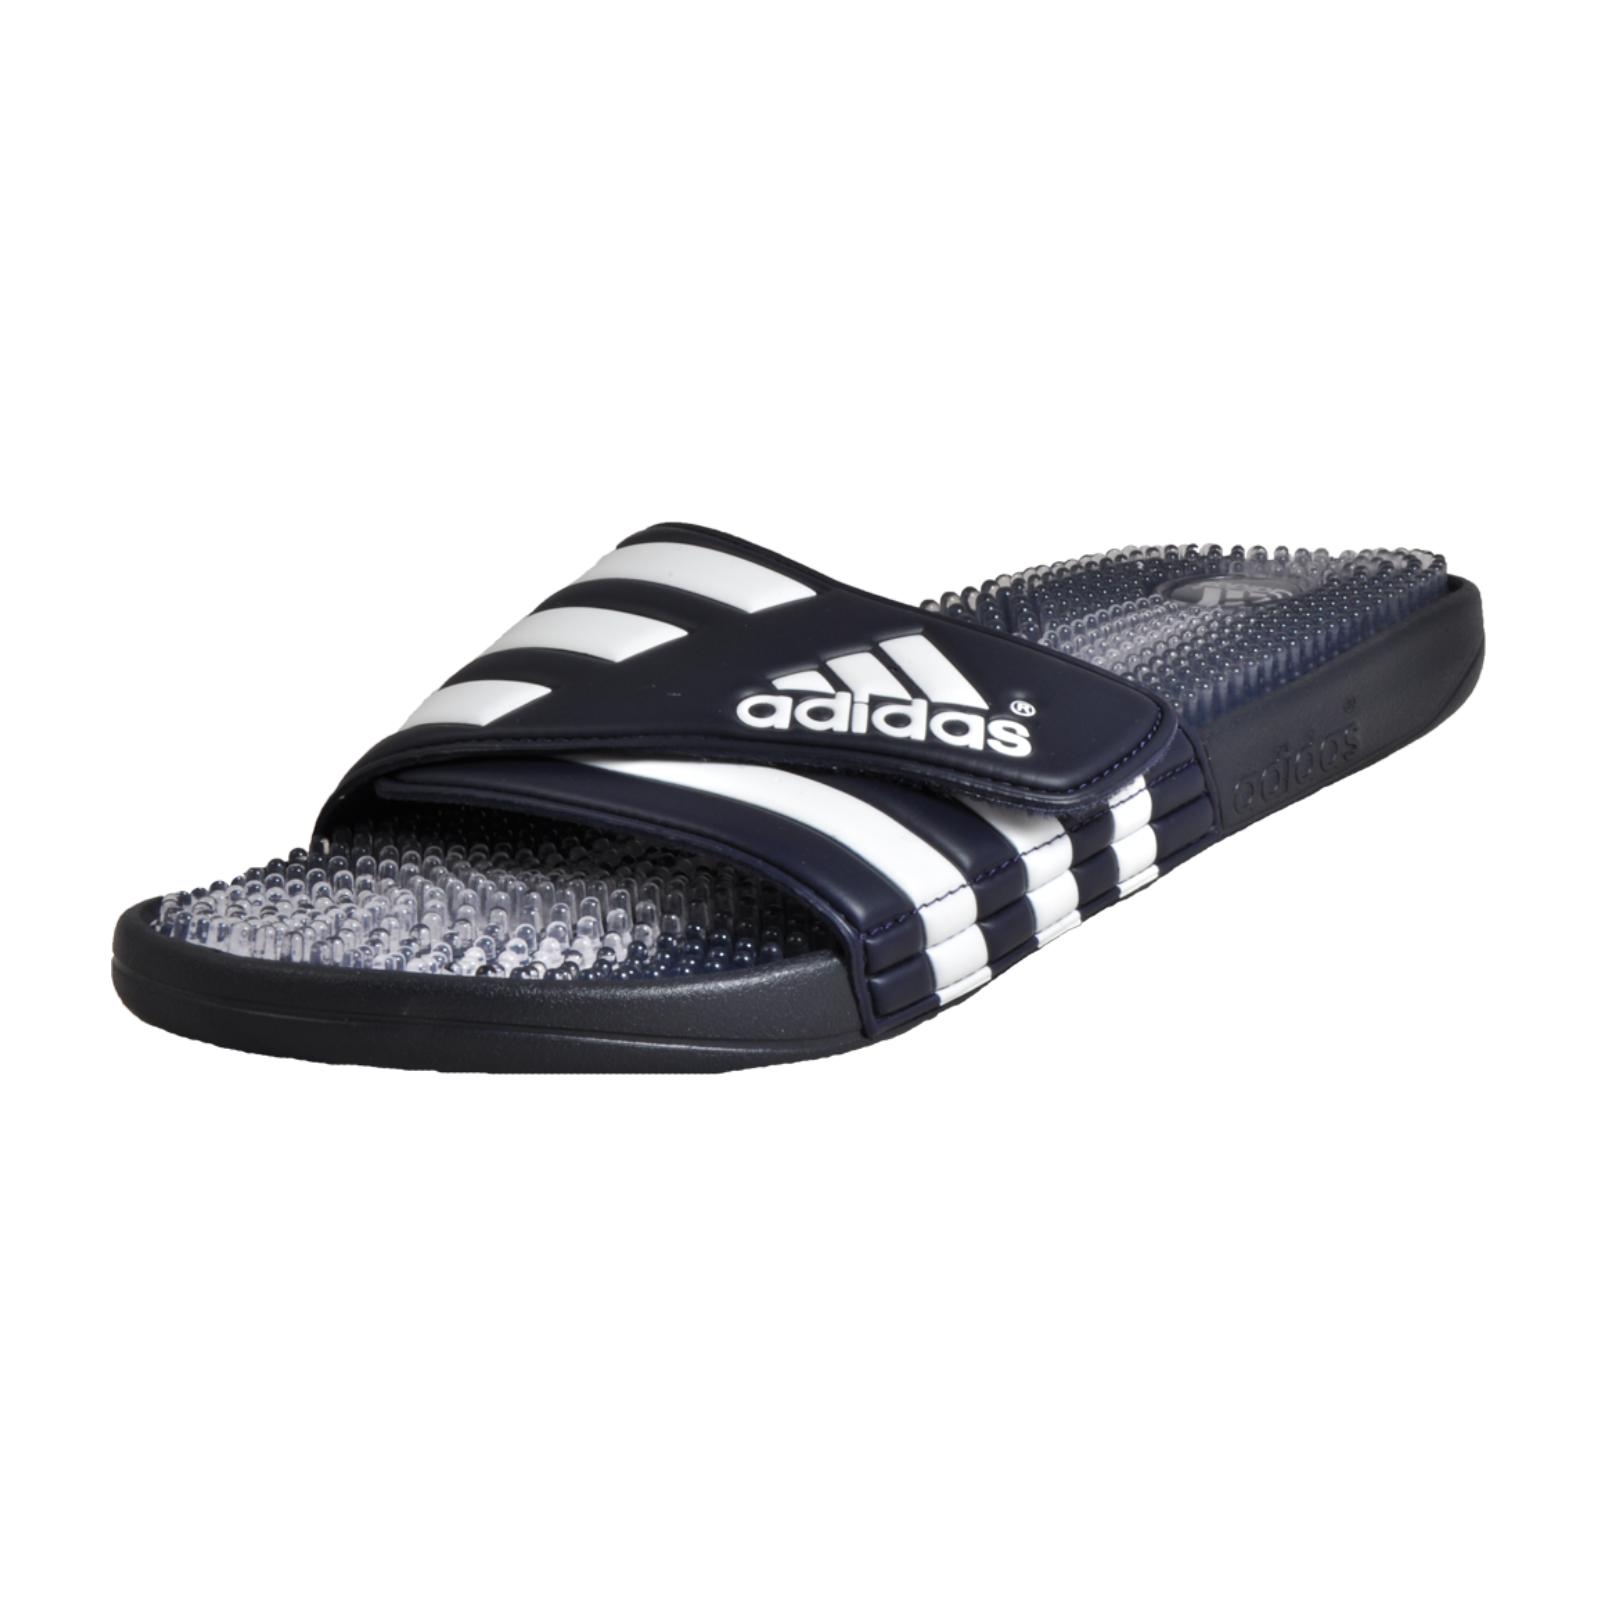 824ec8044135 Details about Adidas Santiossage Mens Slides Beach Flip Flops Shower Sandals  Navy Big Sizes